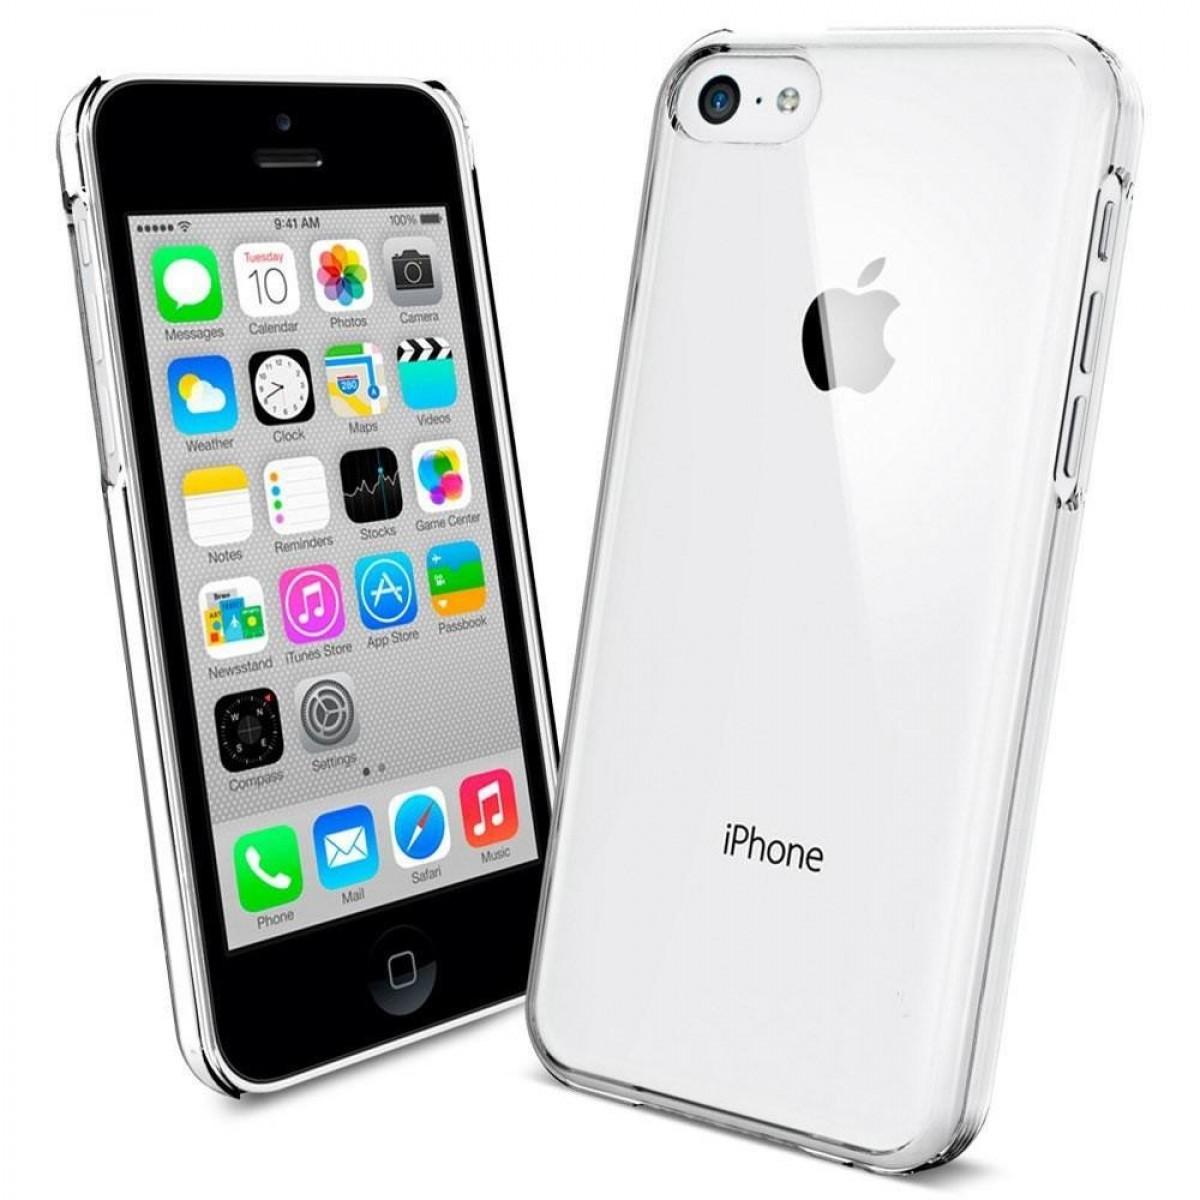 muhuu importados capa iphone 5c transparente silicone. Black Bedroom Furniture Sets. Home Design Ideas